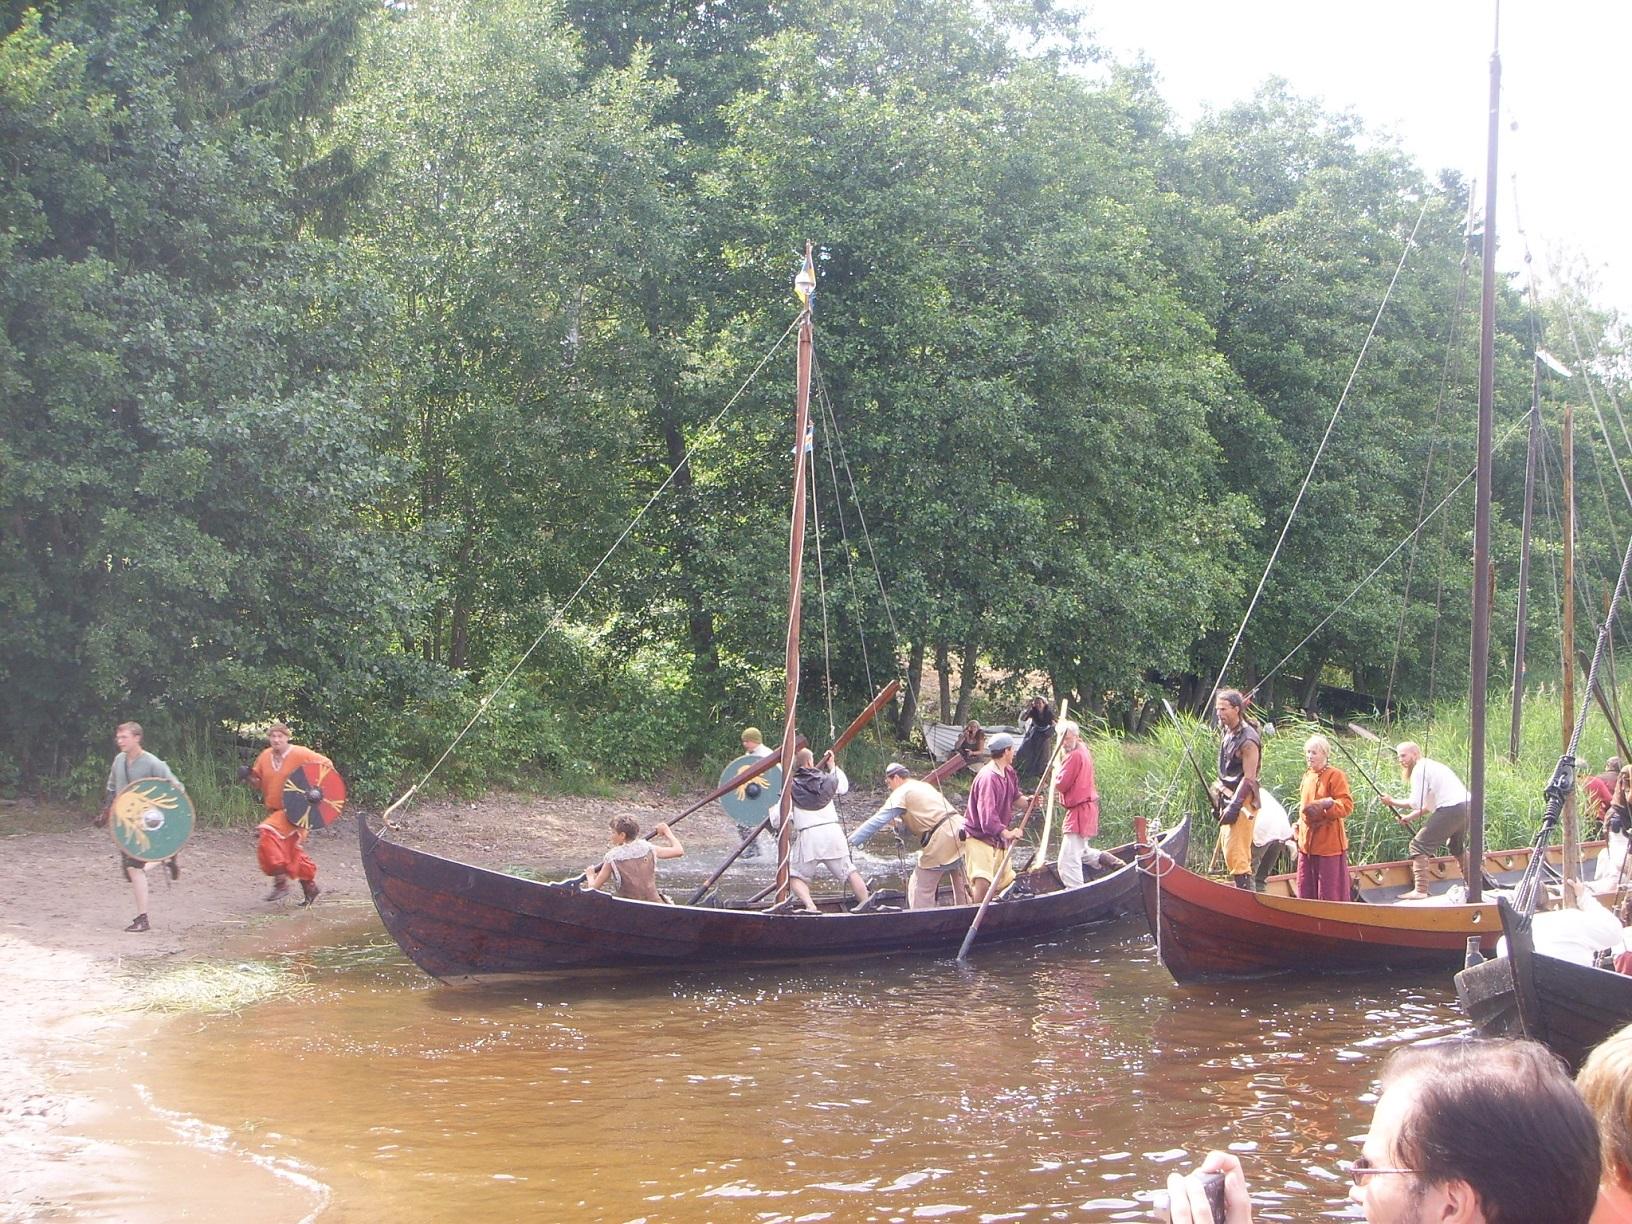 Vikingamarknad in Kvarnbo